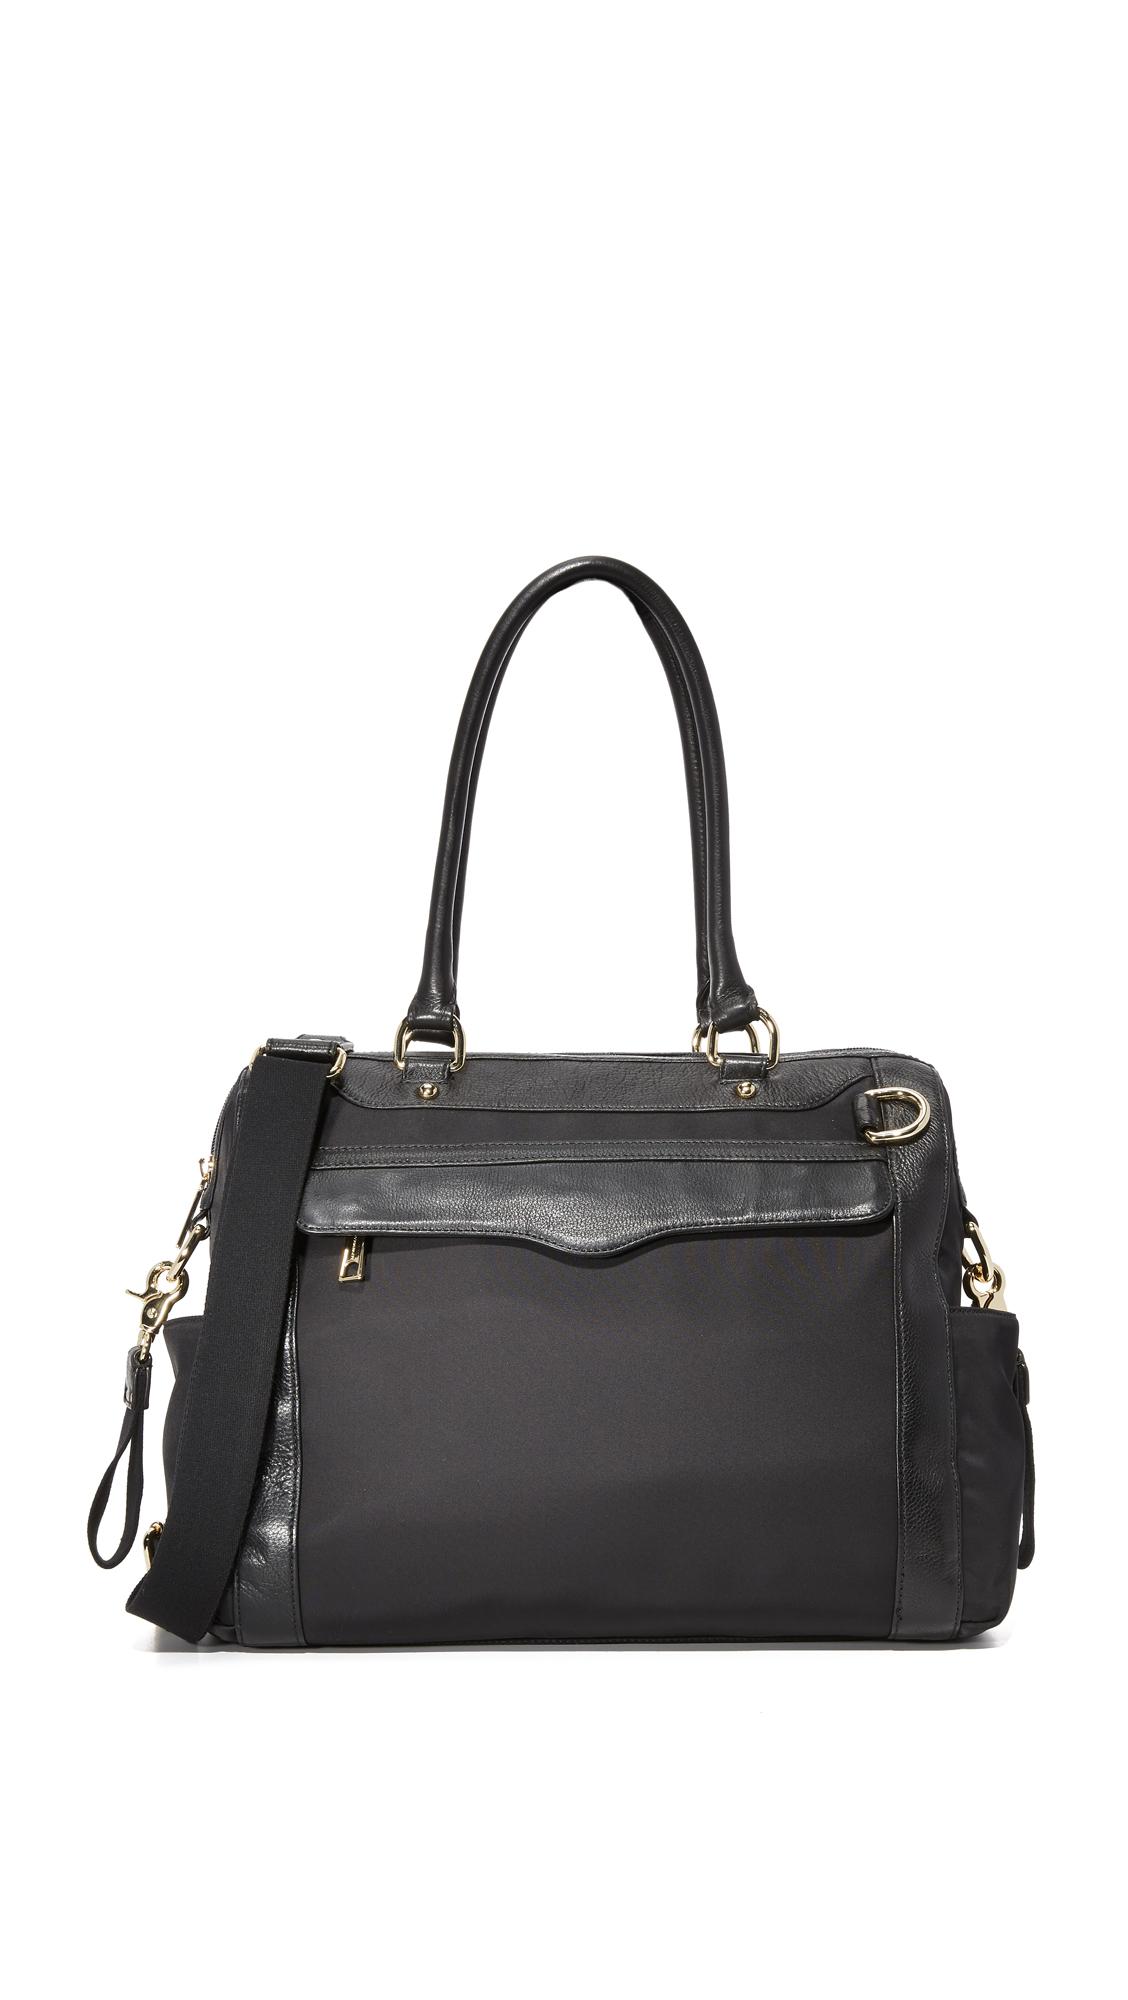 Rebecca Minkoff Knocked Up Baby Bag - Black/Black